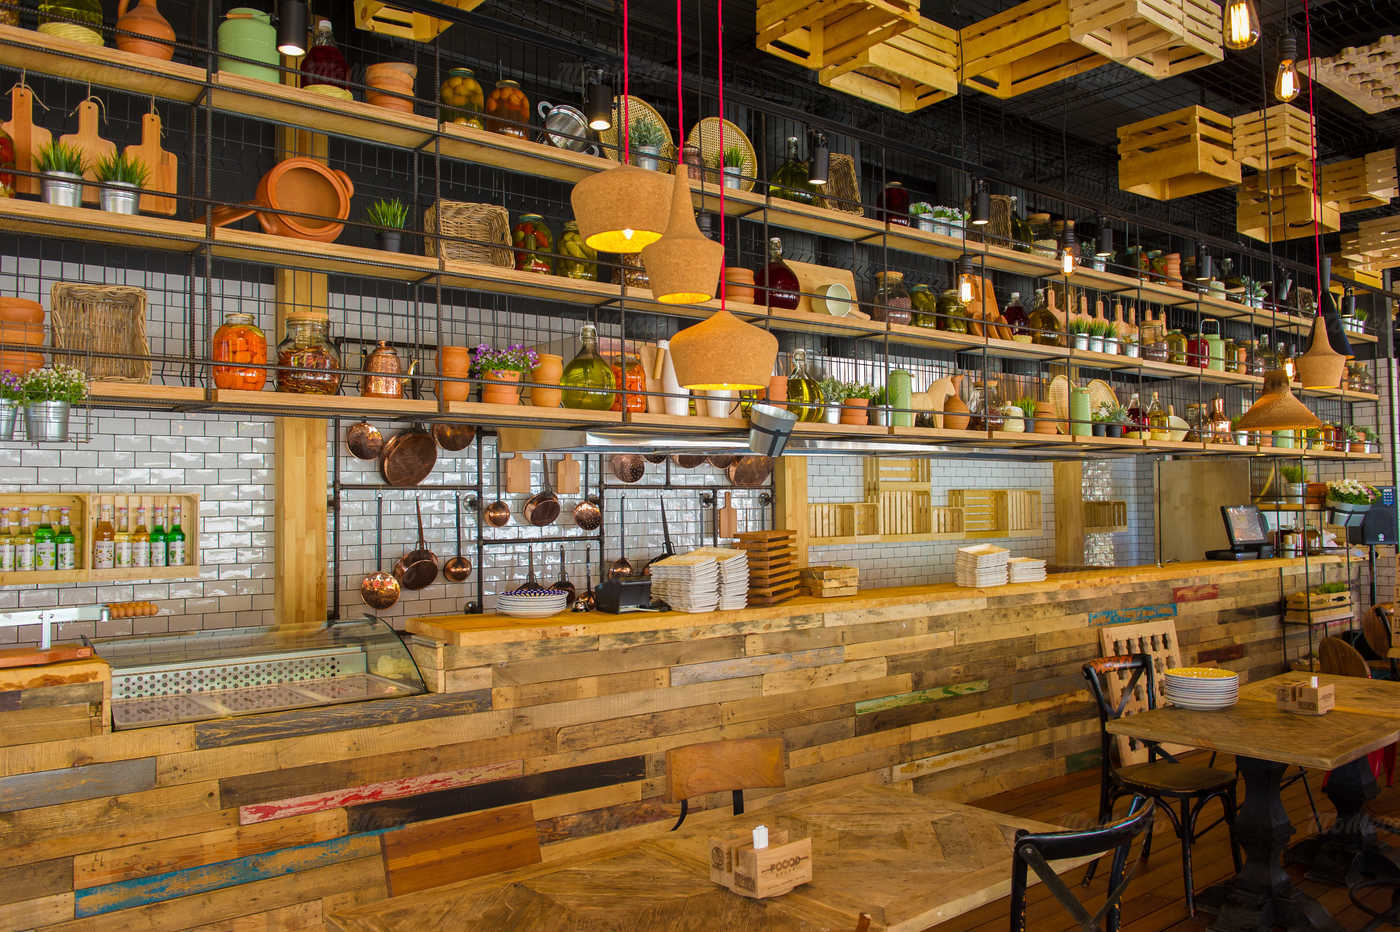 Банкеты ресторана FOOD BAZAR (Фуд базар) на улице Каретный Ряд фото 12